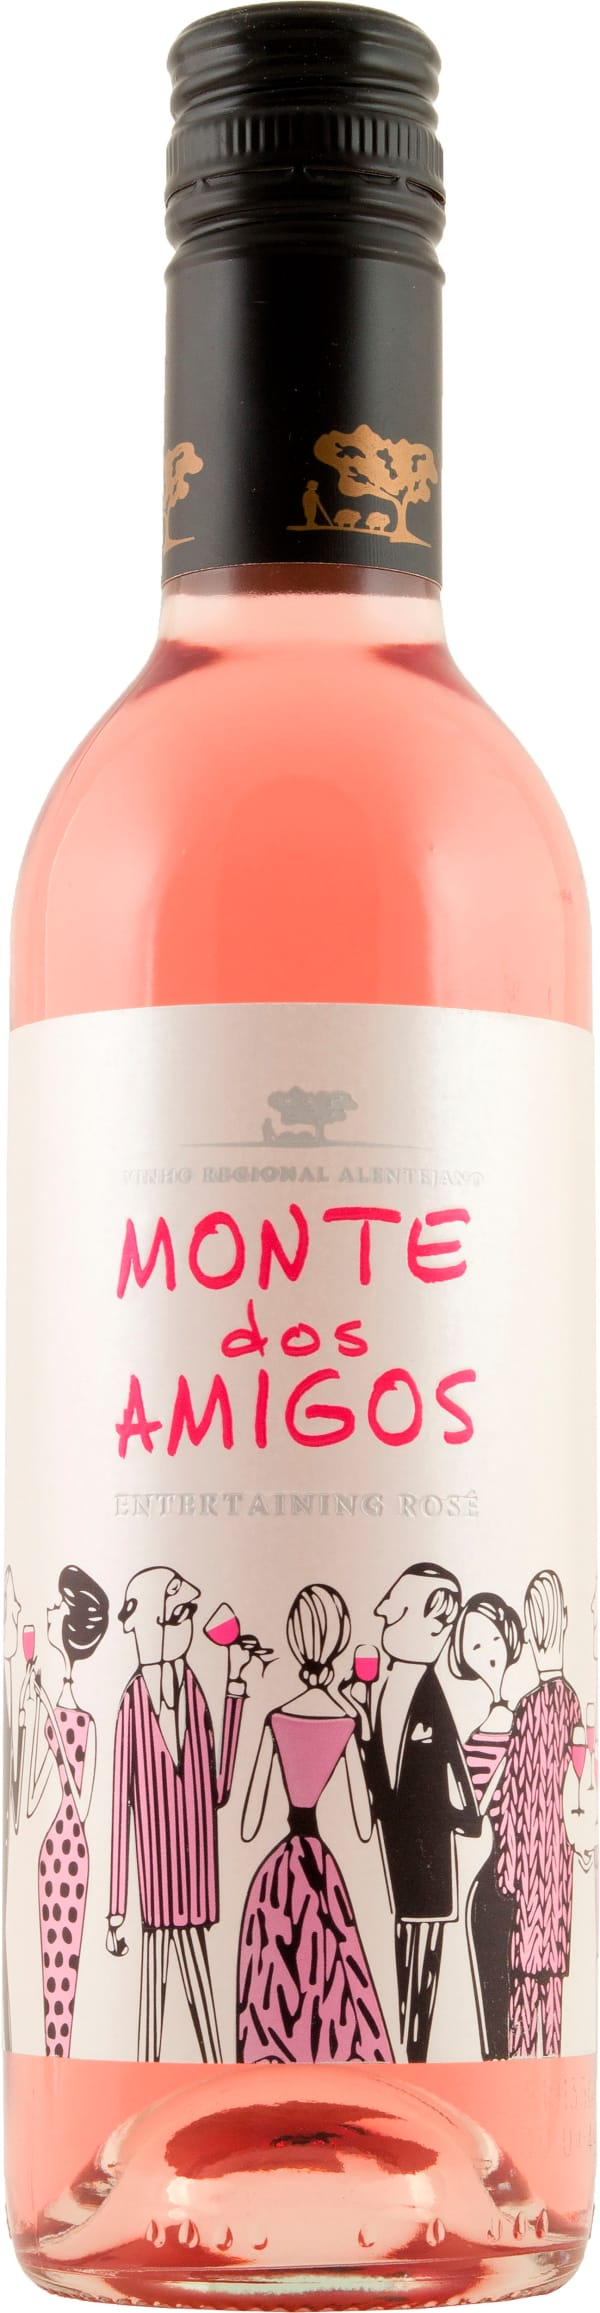 Monte dos Amigos Rosé 2019